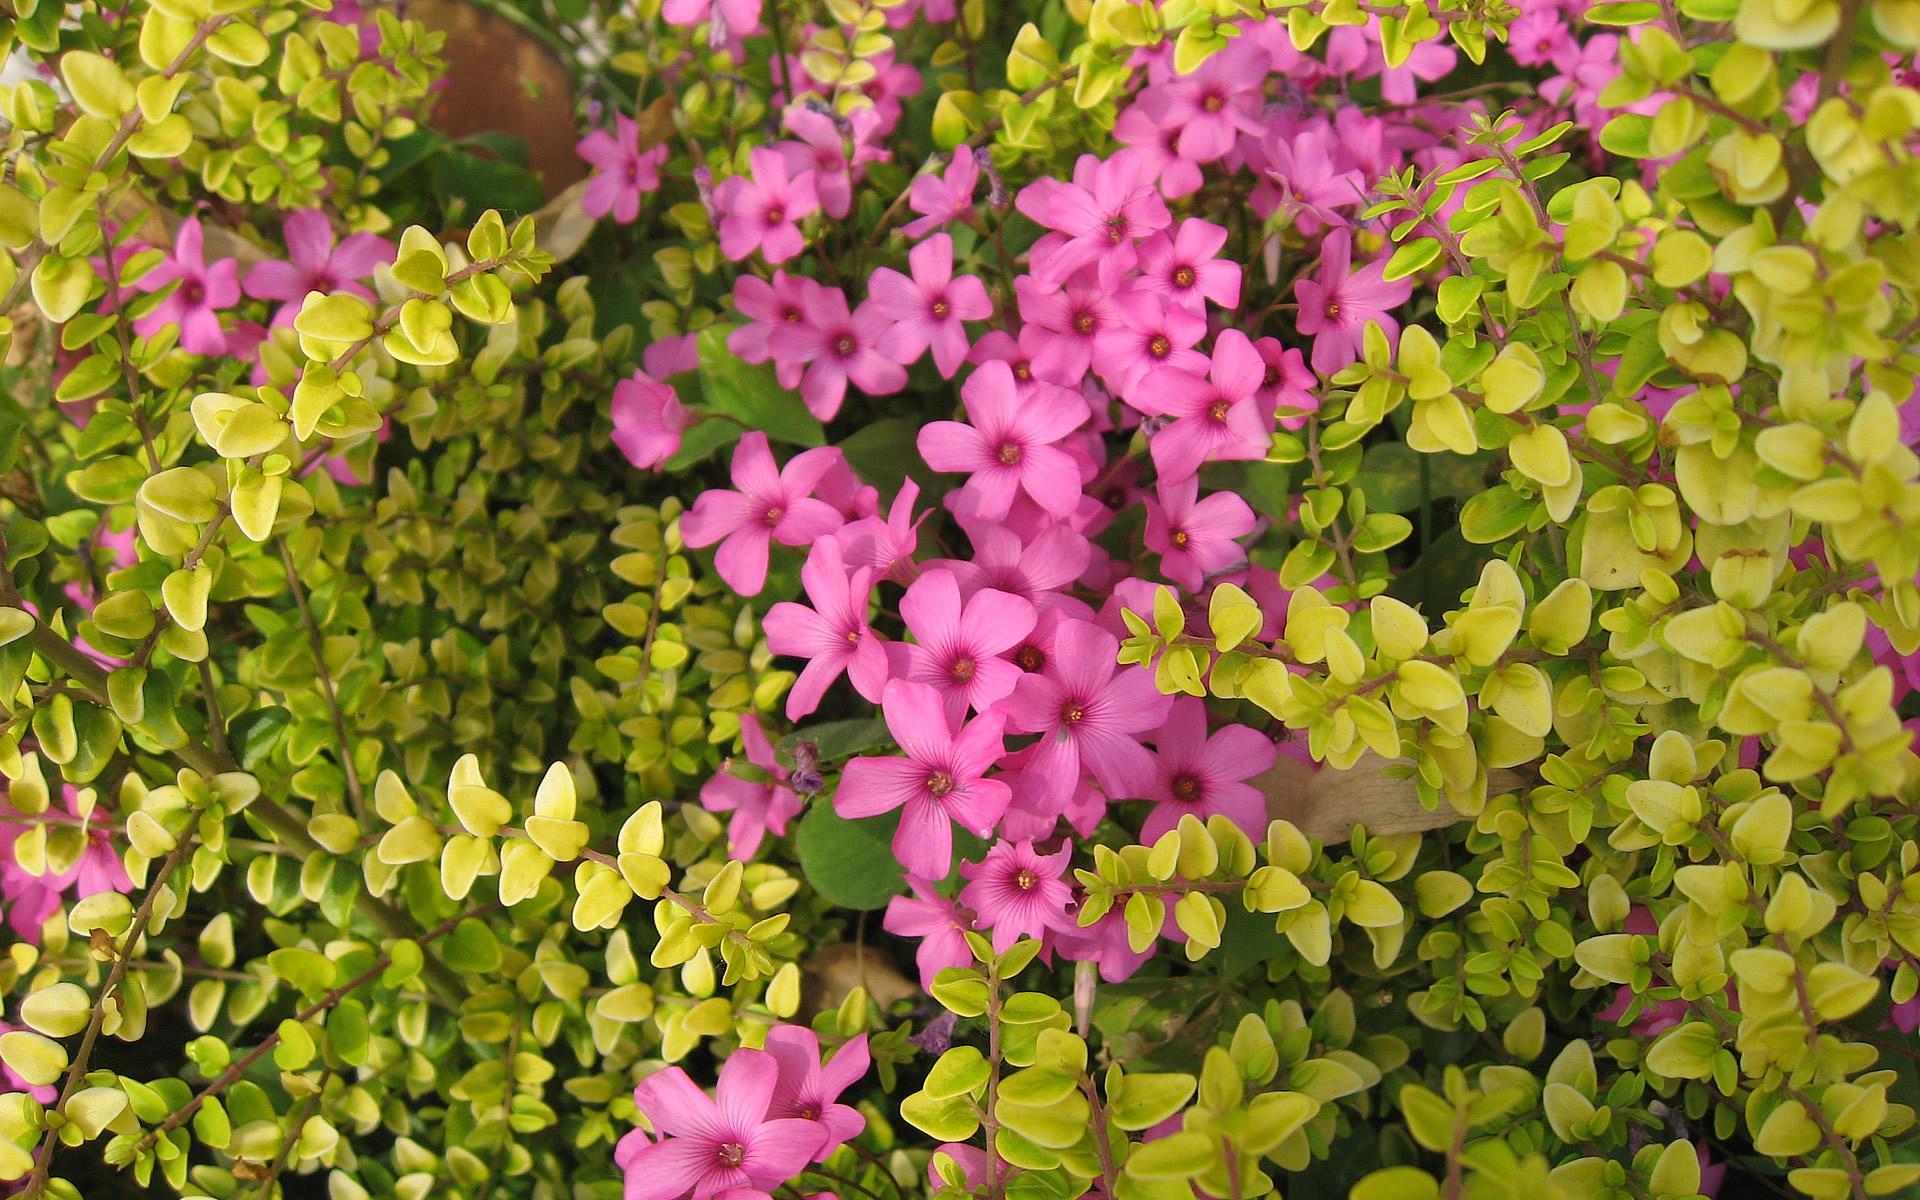 Mediterrenean Flower Wallpaper Widescreen